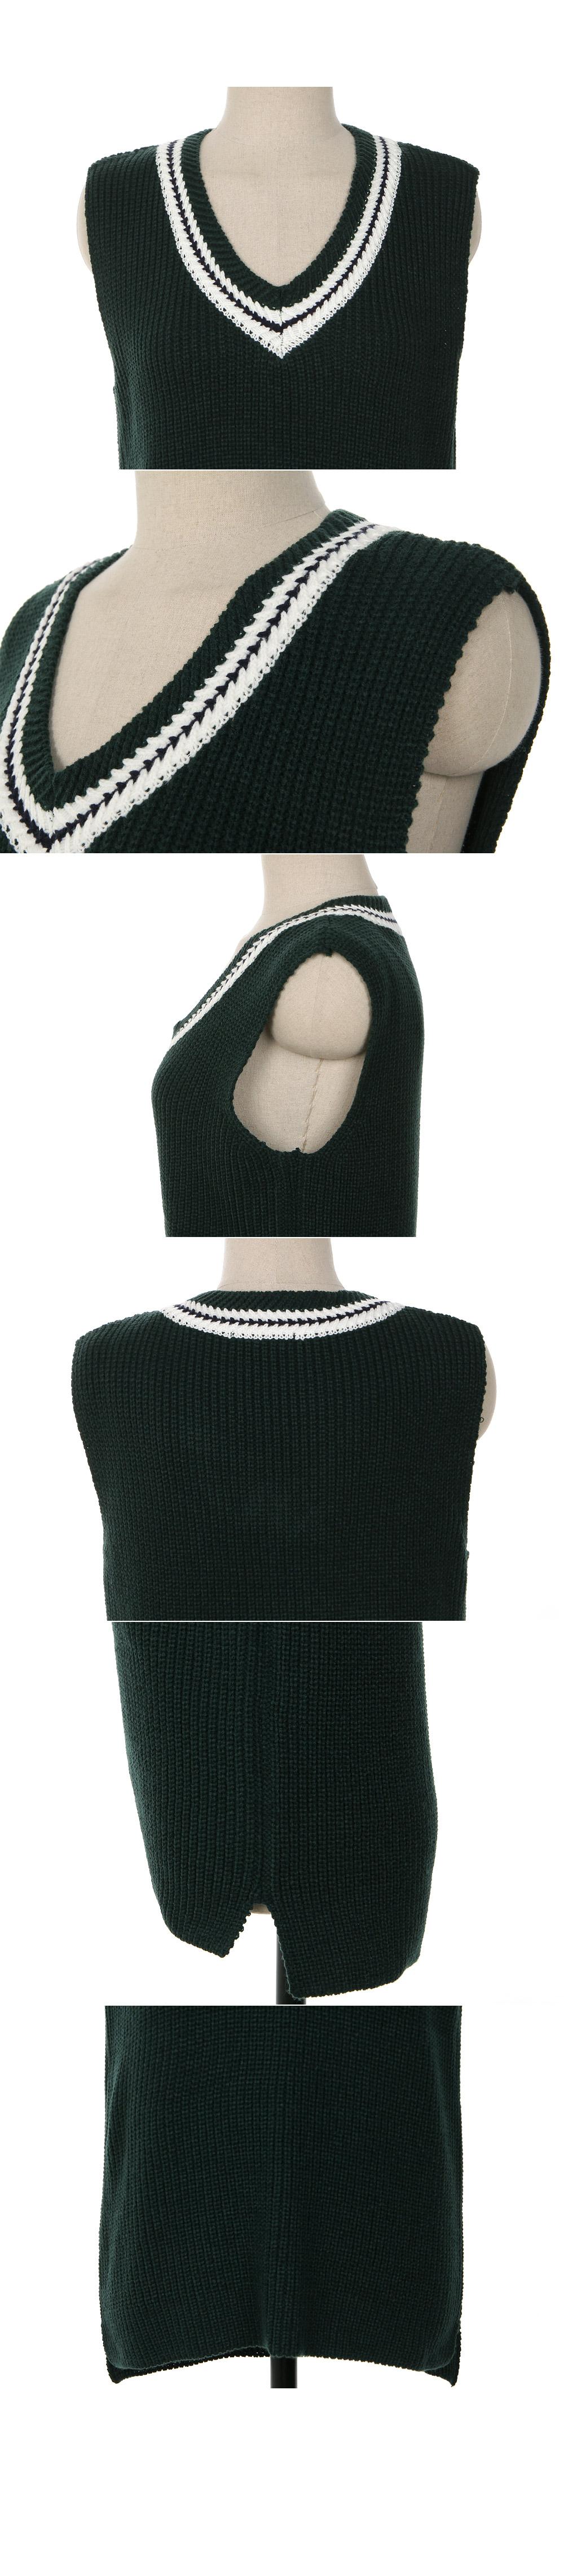 Trill color vest black